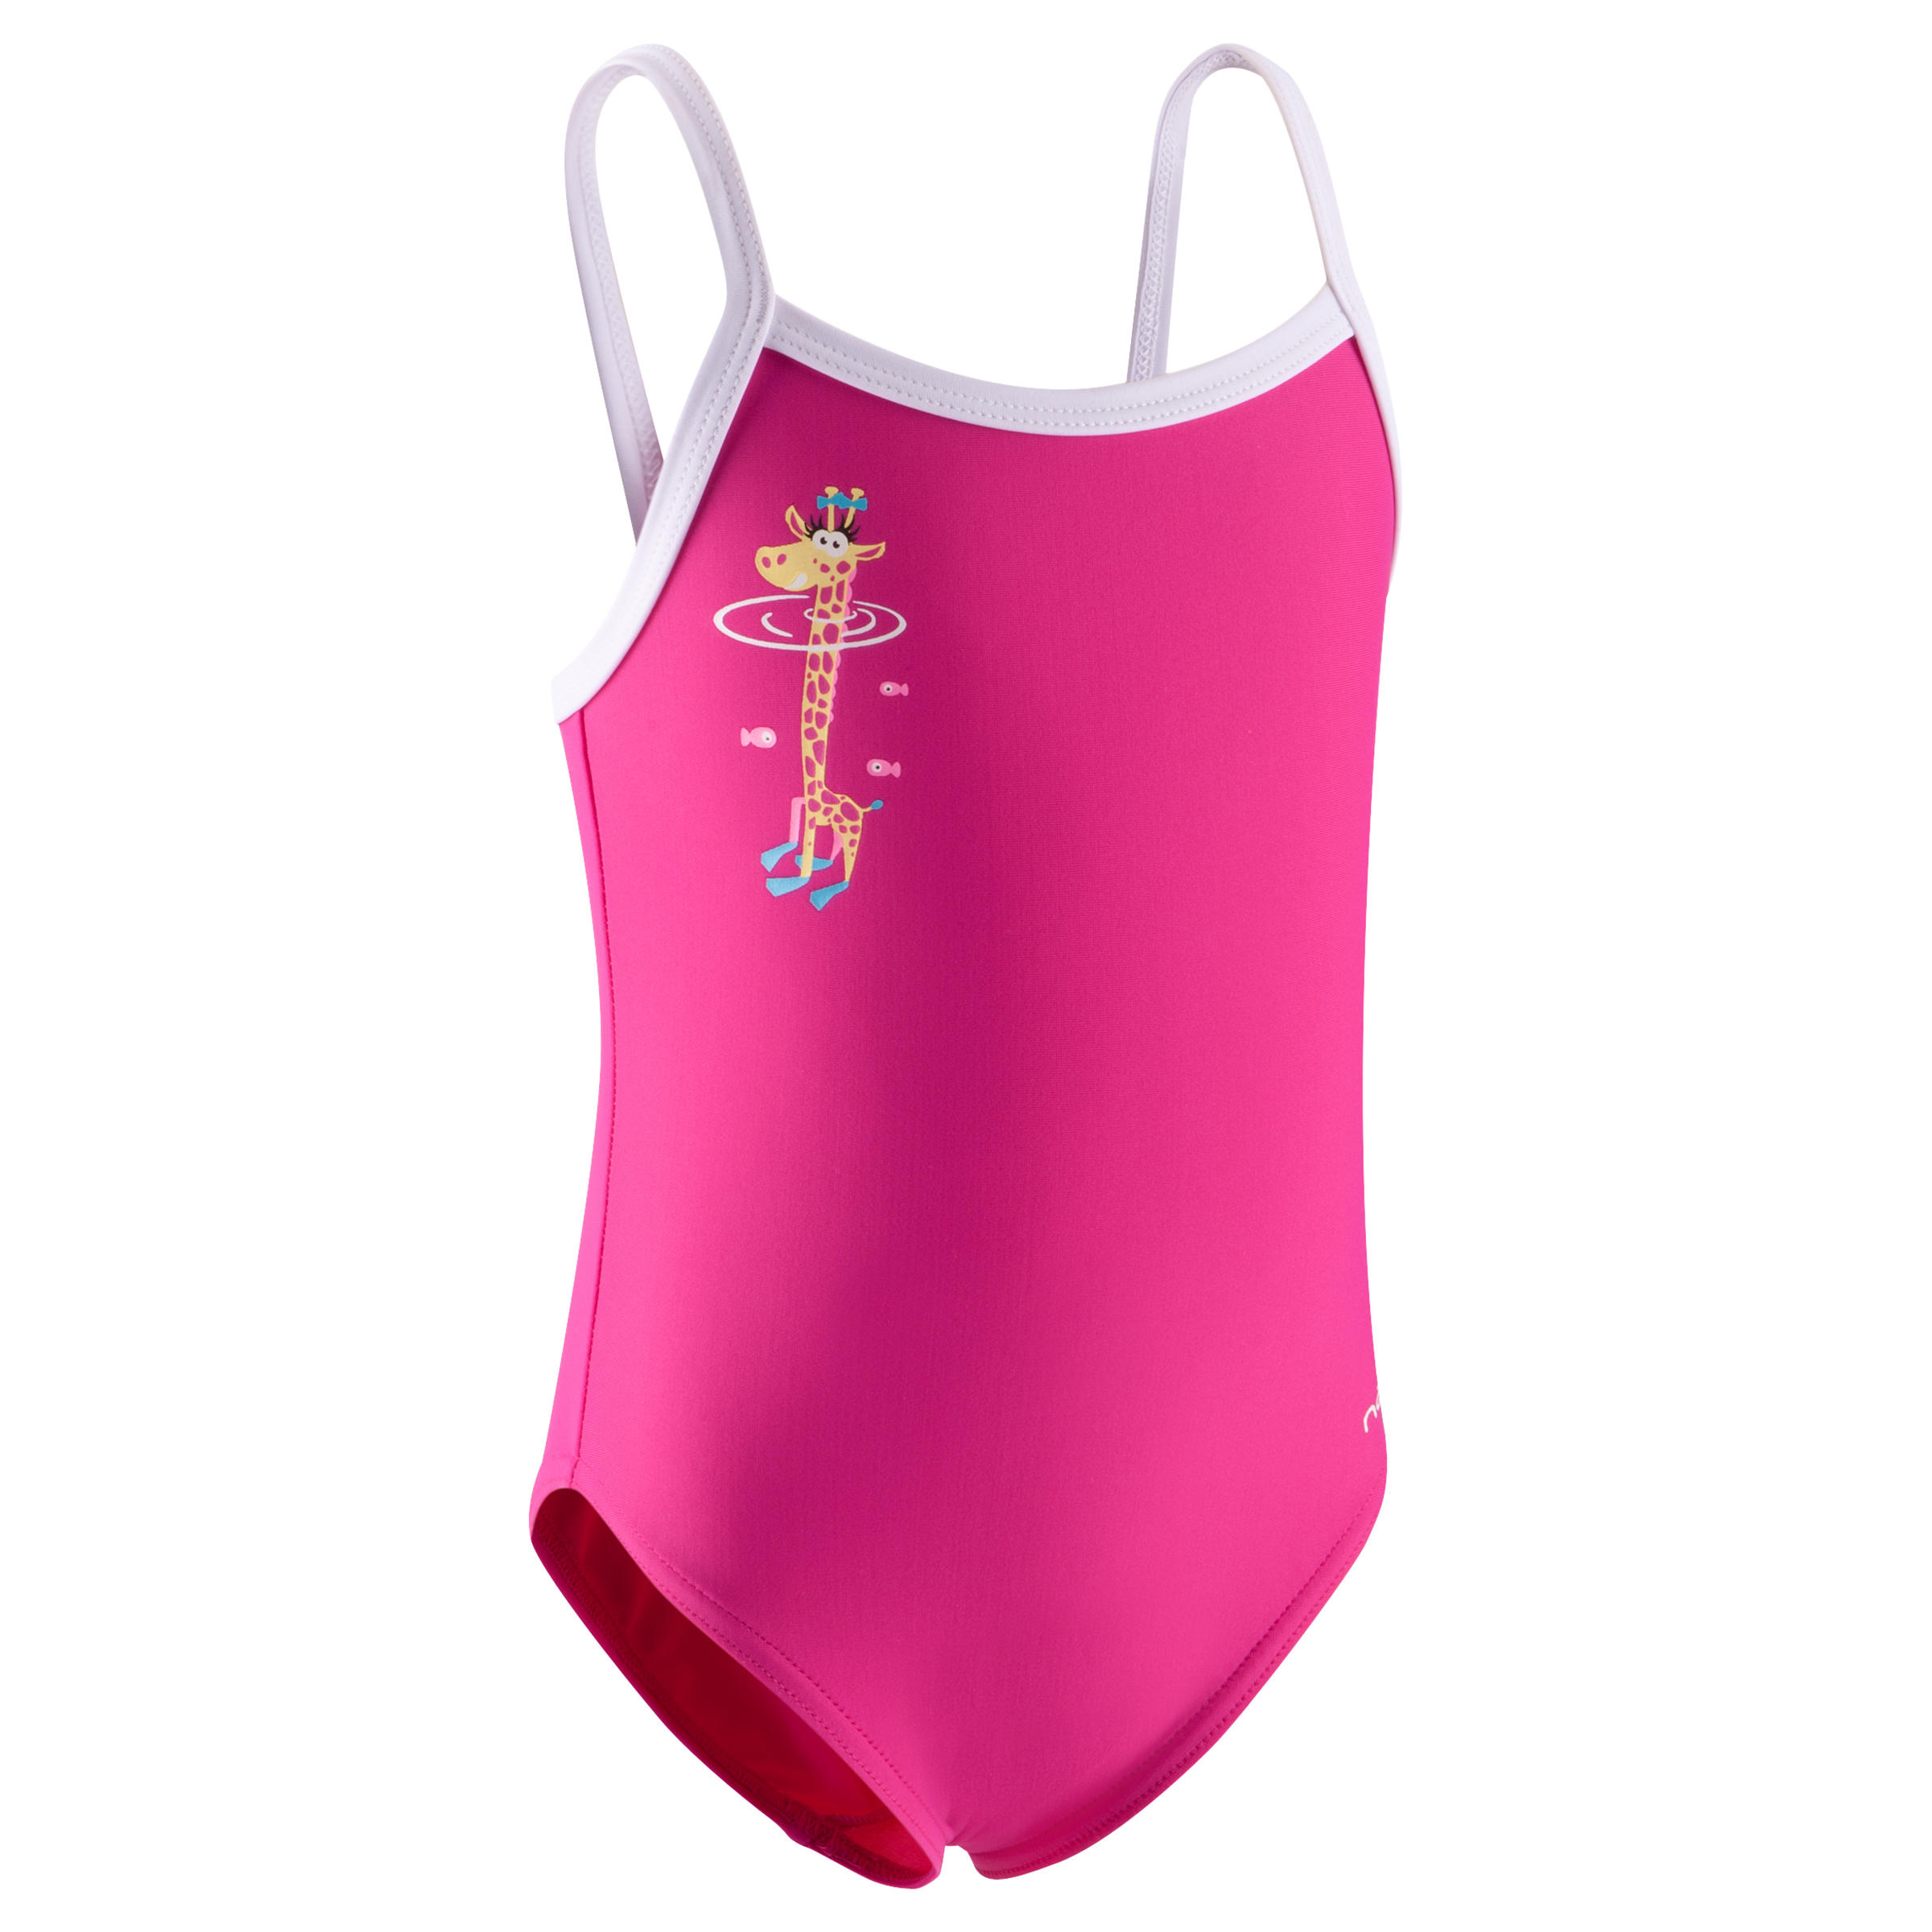 Madina Baby Girls' One-Piece Swimsuit - Gigi Pink